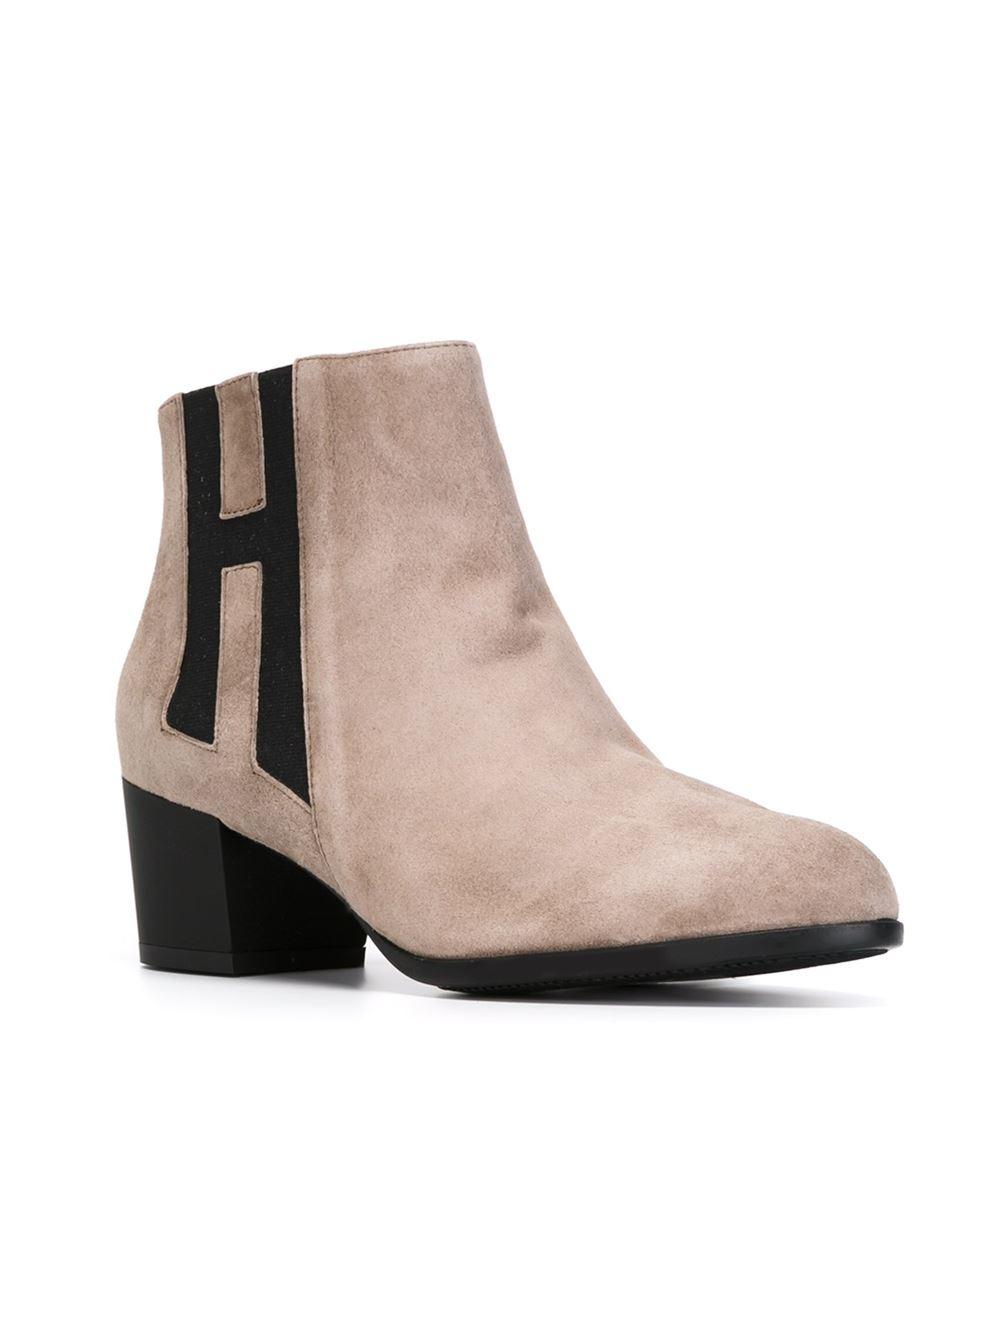 hogan h panel suede ankle boots in beige nude neutrals lyst. Black Bedroom Furniture Sets. Home Design Ideas